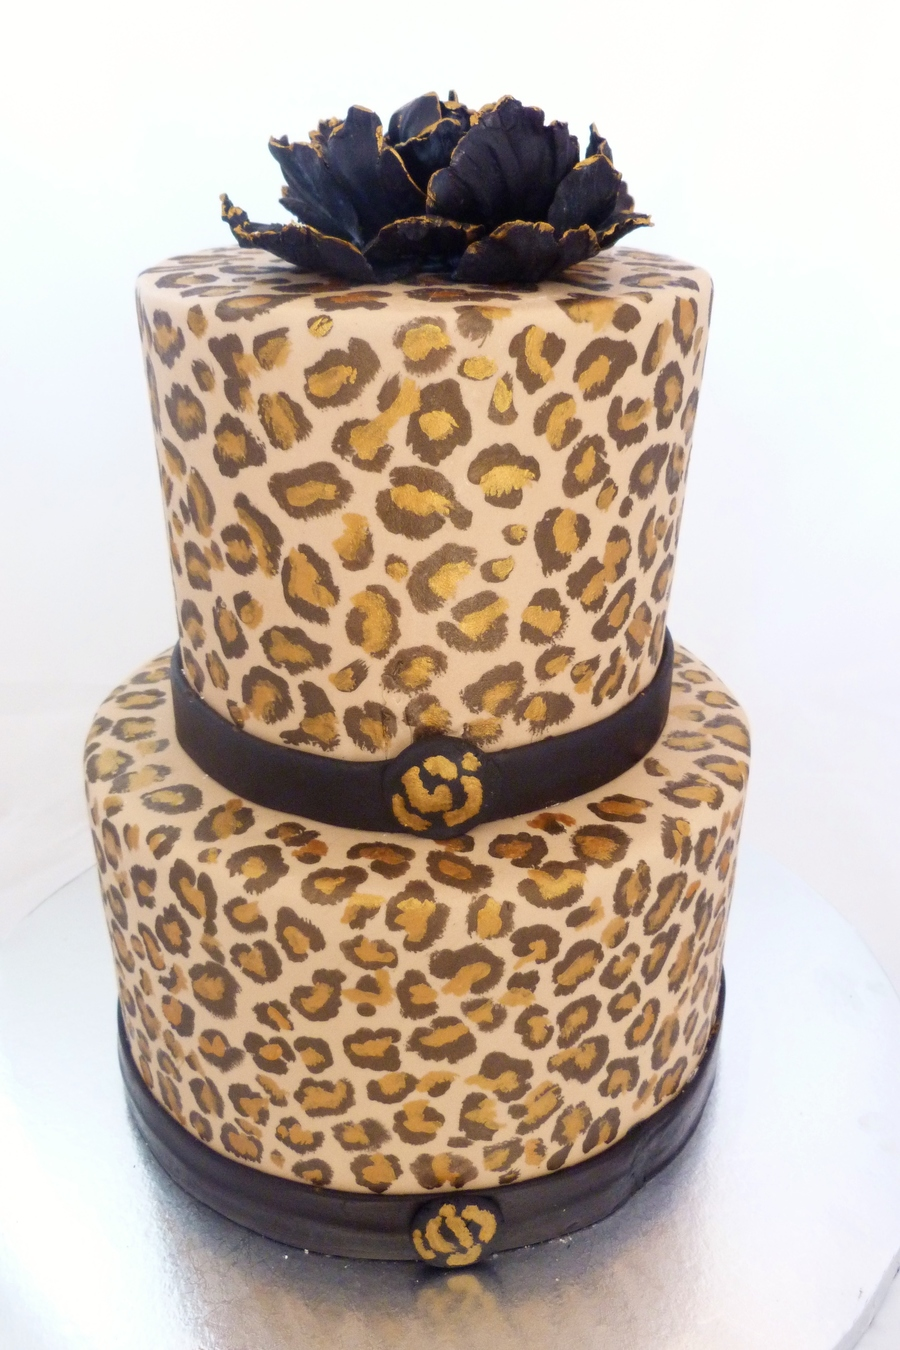 Handpainted cheetah print cake - Cheetah print centerpieces ...